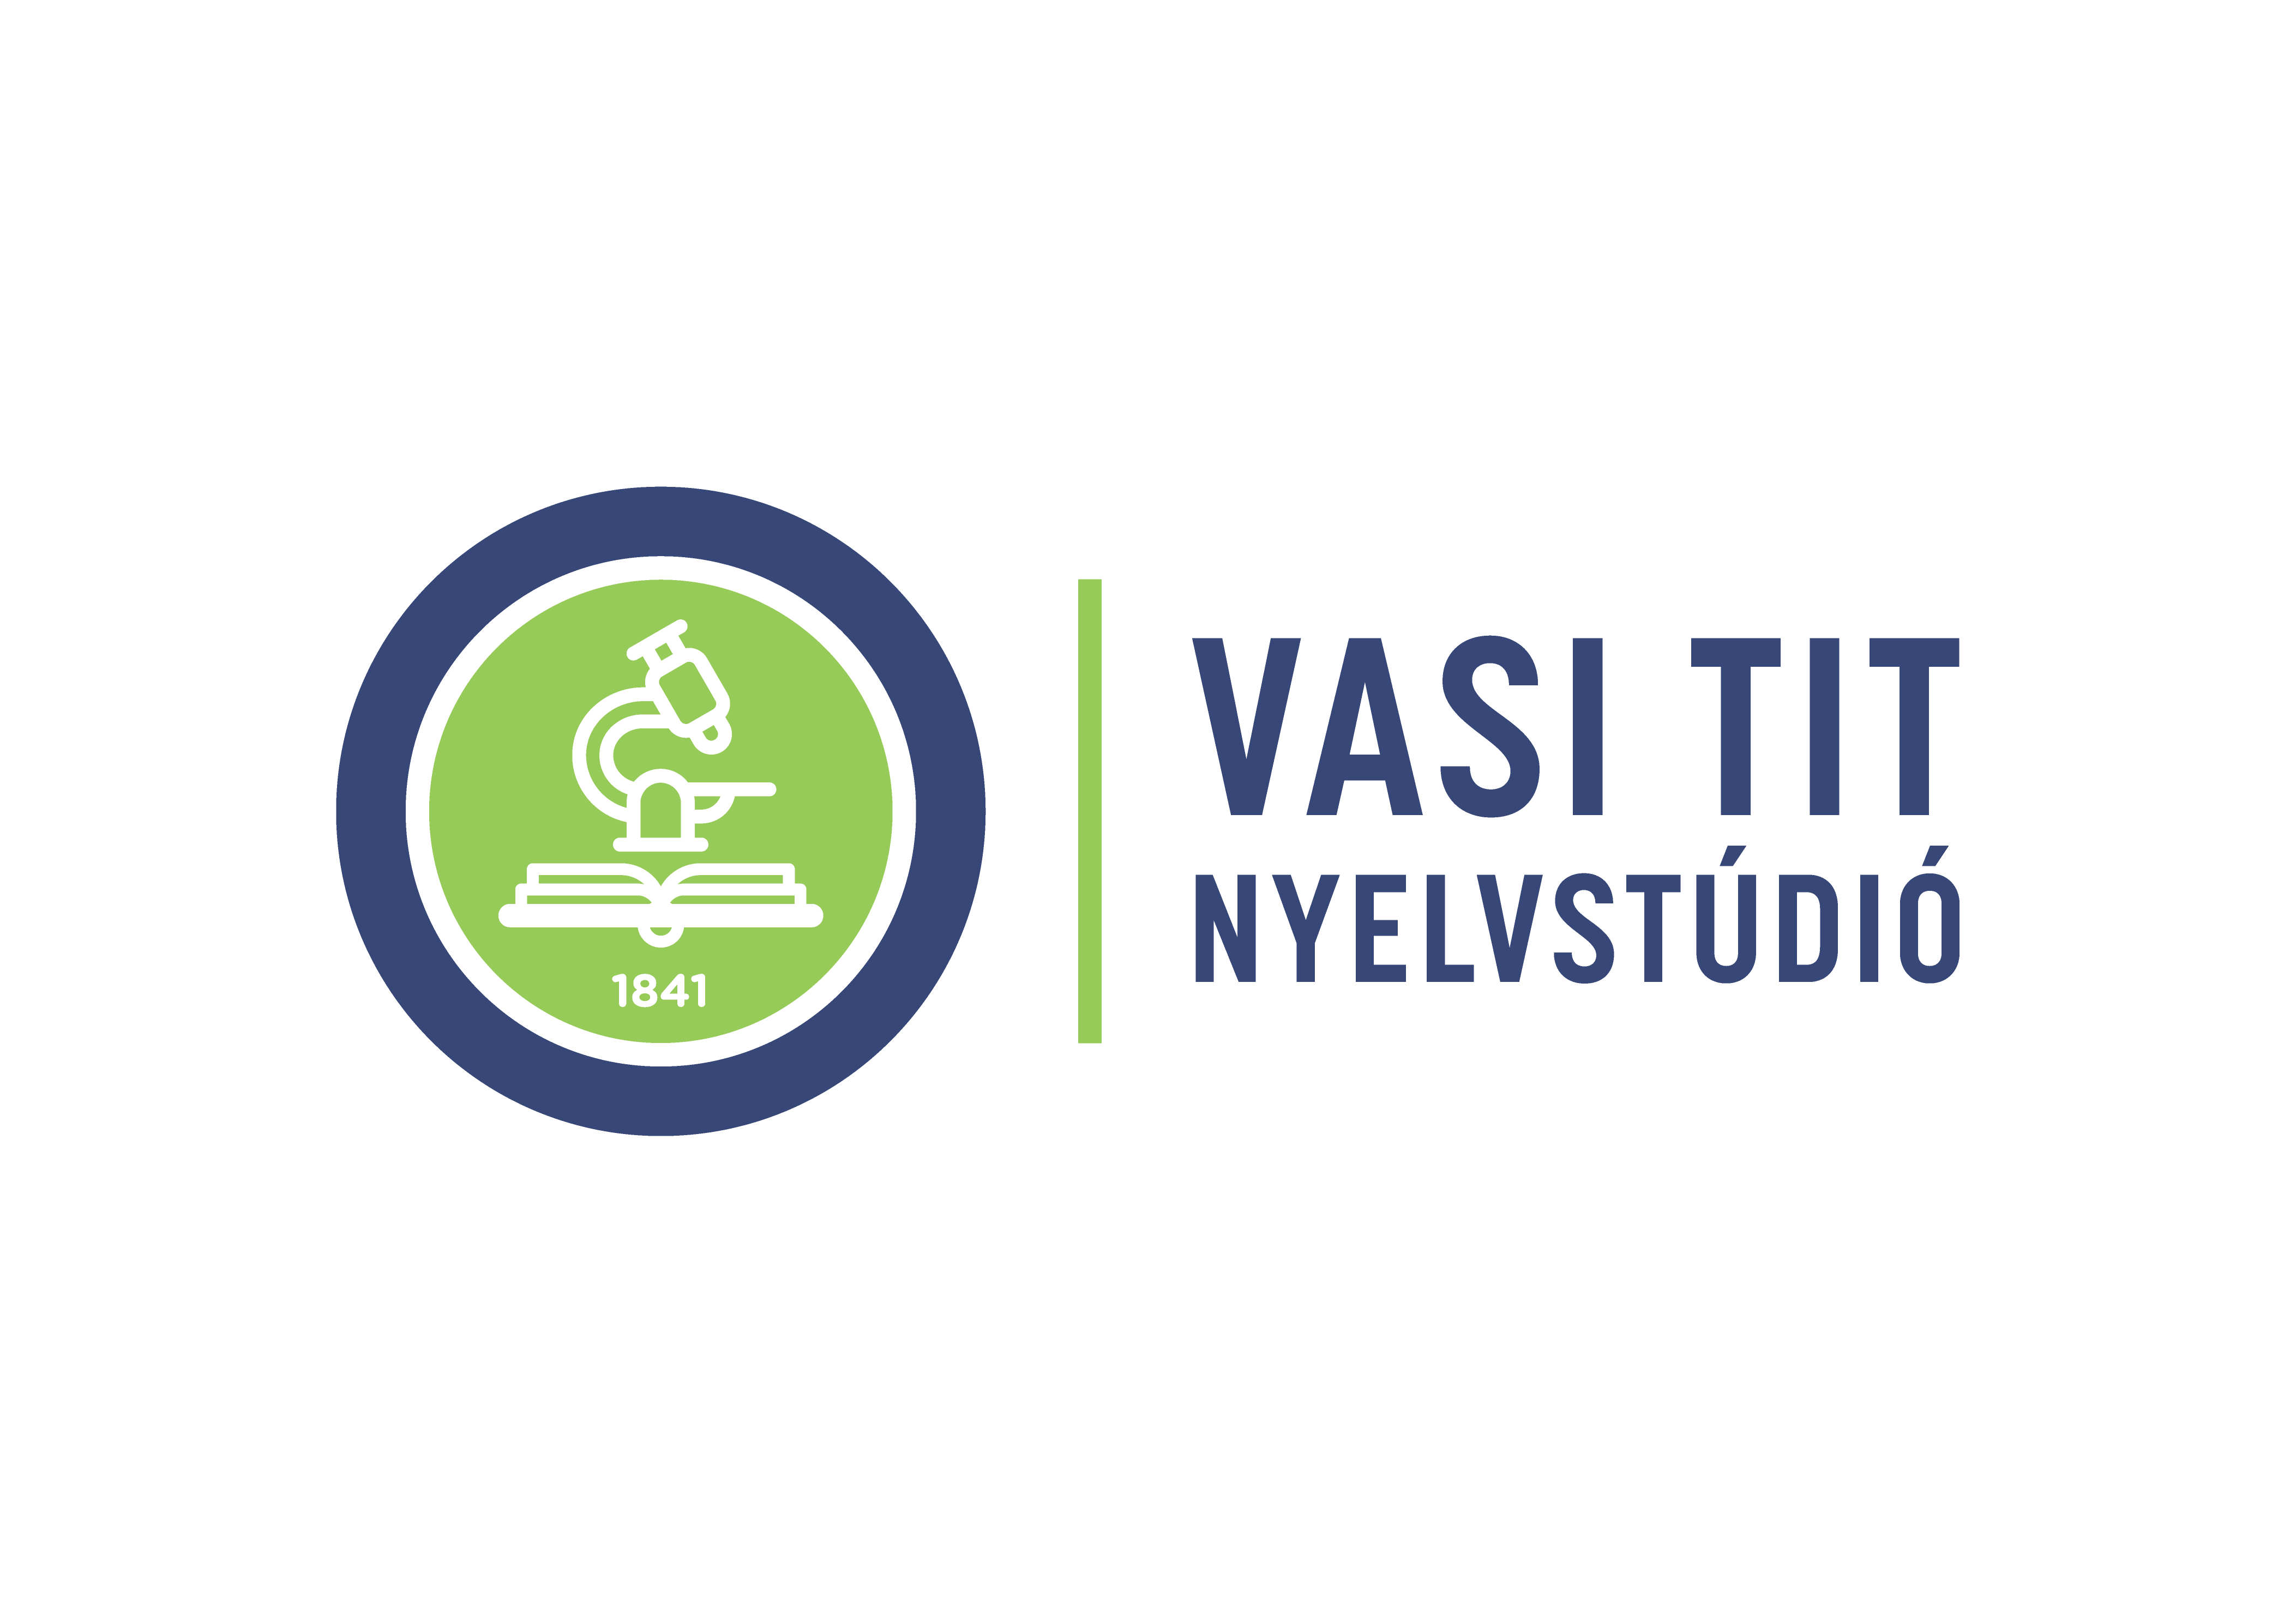 Vasi TIT Nyelvstúdió honlapja